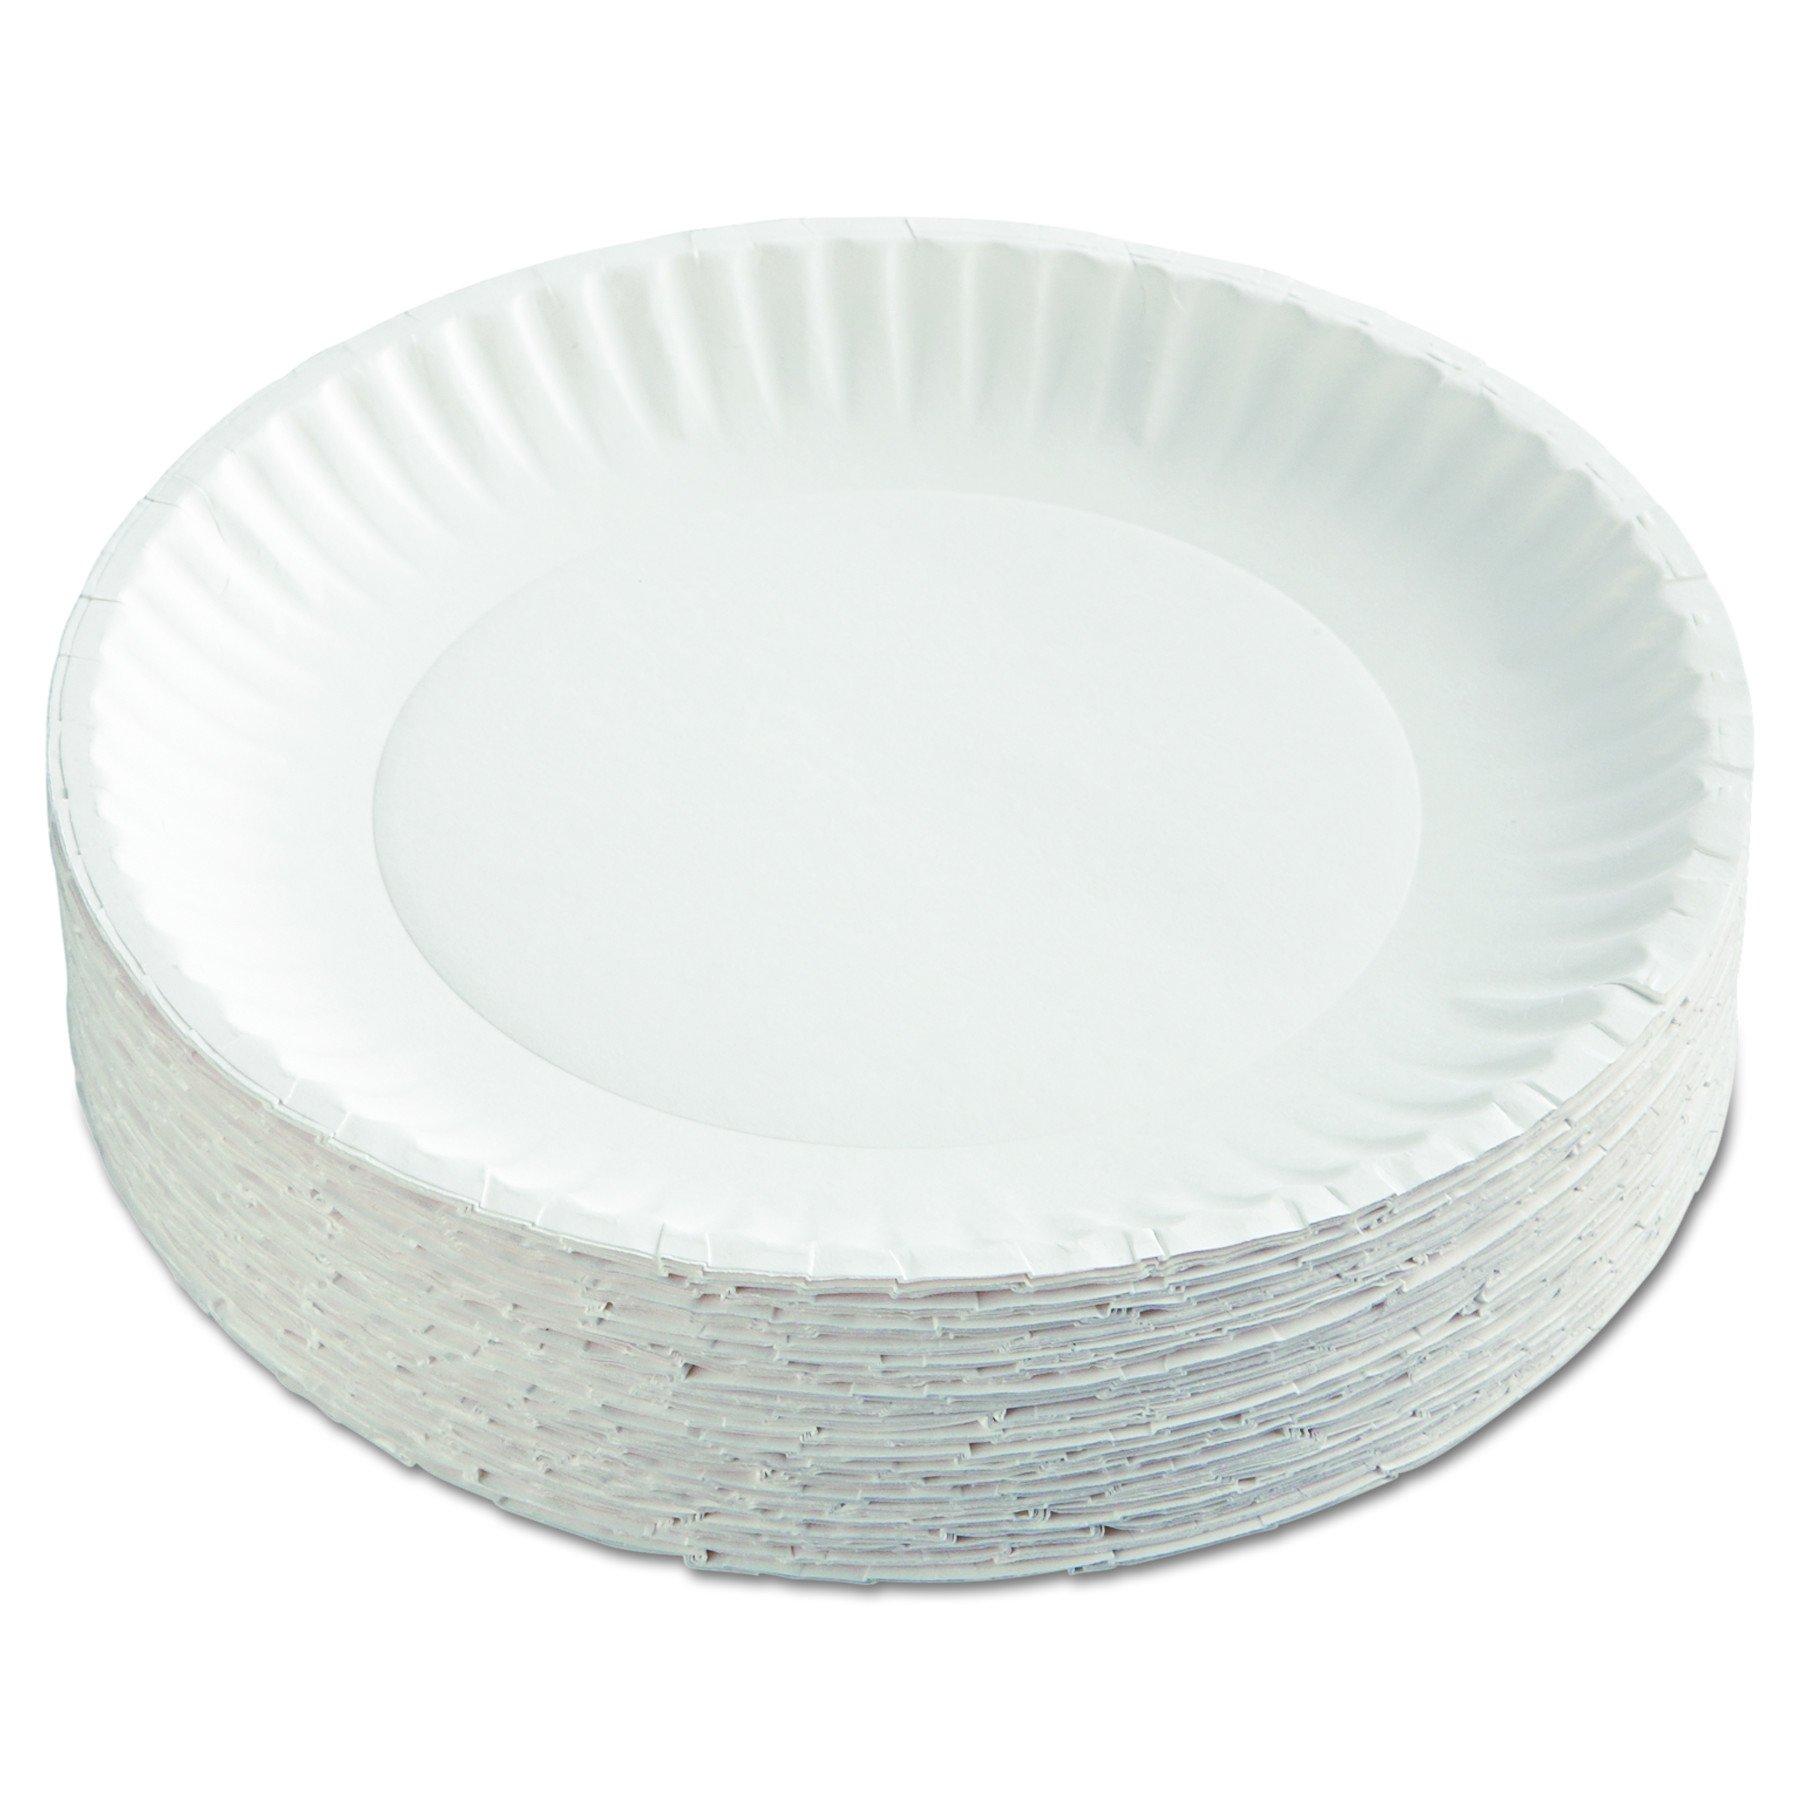 AJM Packaging Corporation PP9GRAWH Paper Plates, 9'' Diameter, White, 12 Packs of 100 (Case of 1200)